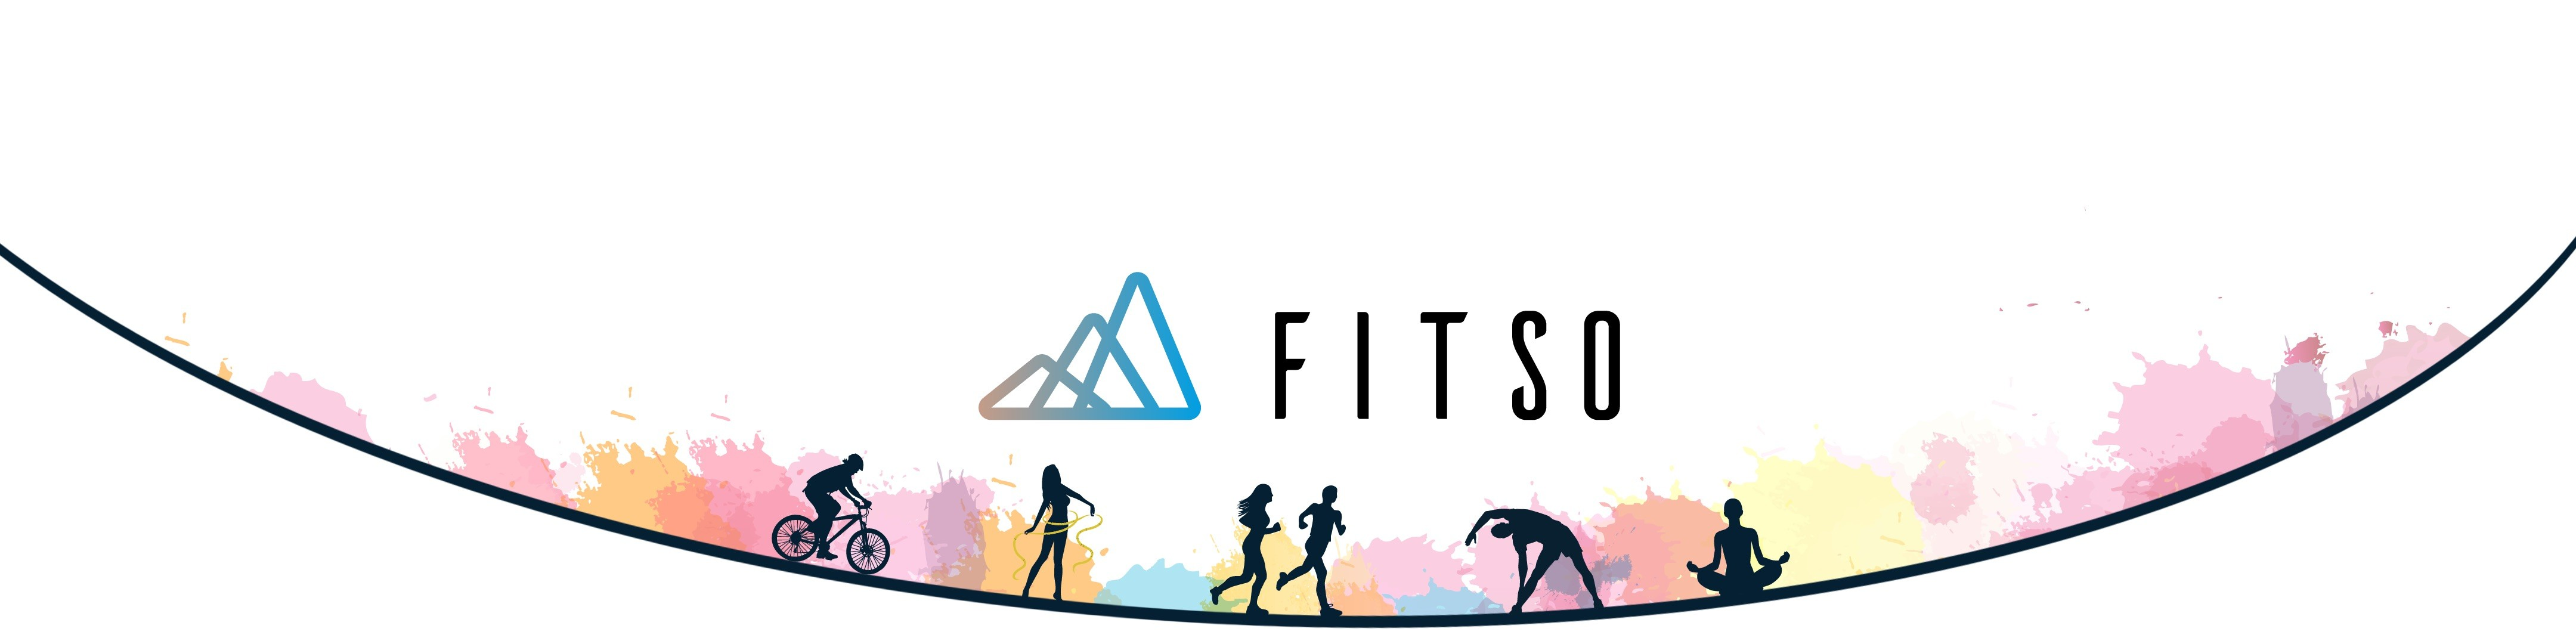 sports startup fitso